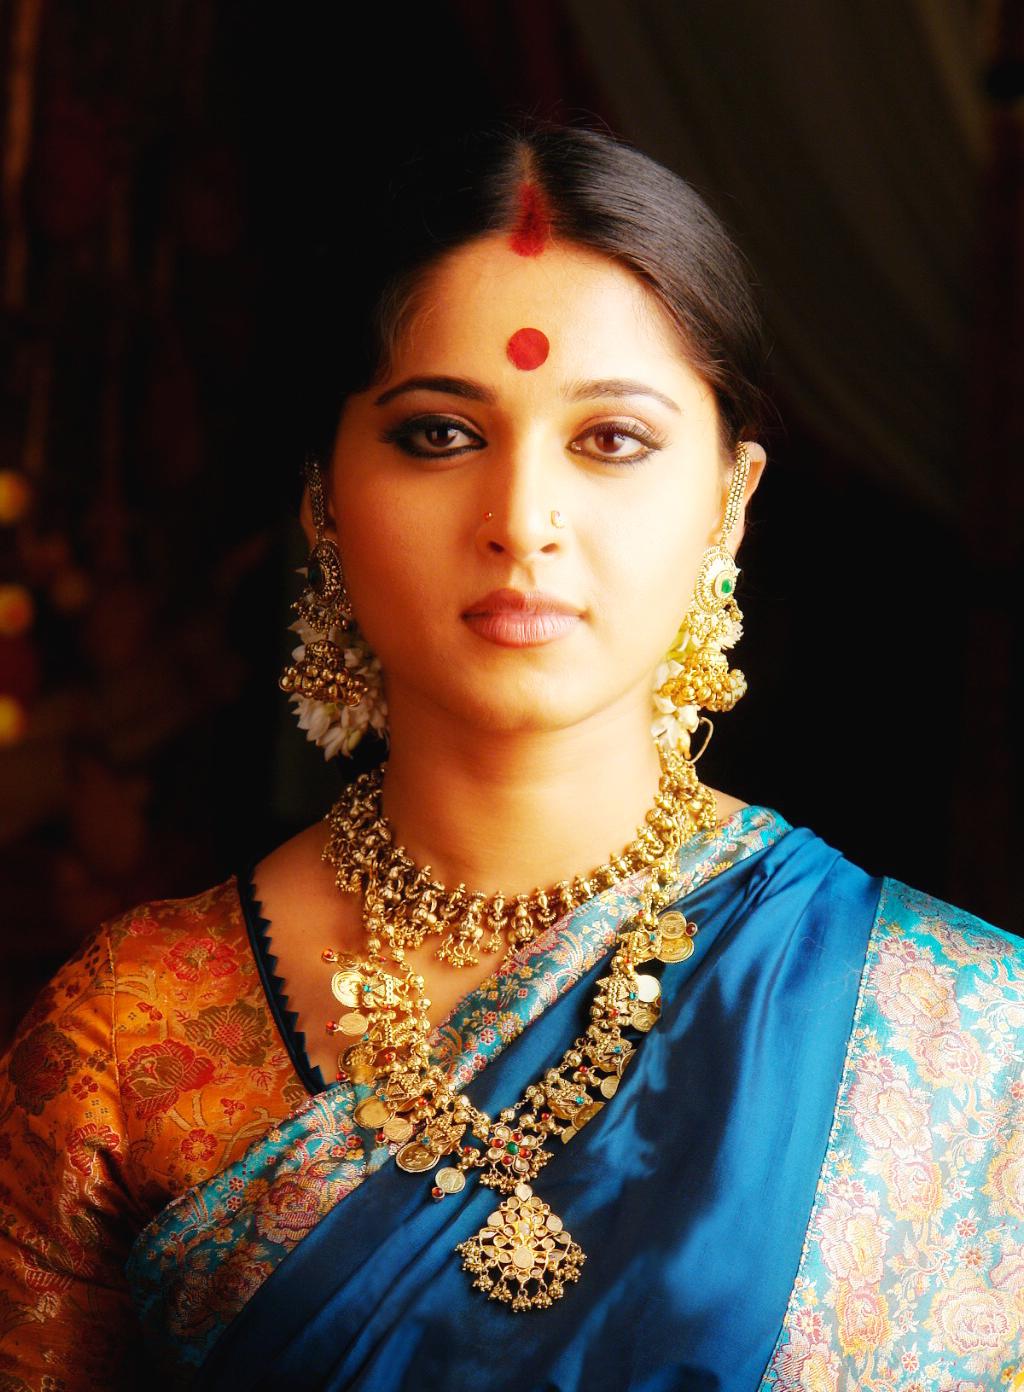 Anushka Shetty Hot Cinema: Anushka Shetty In Telugu And